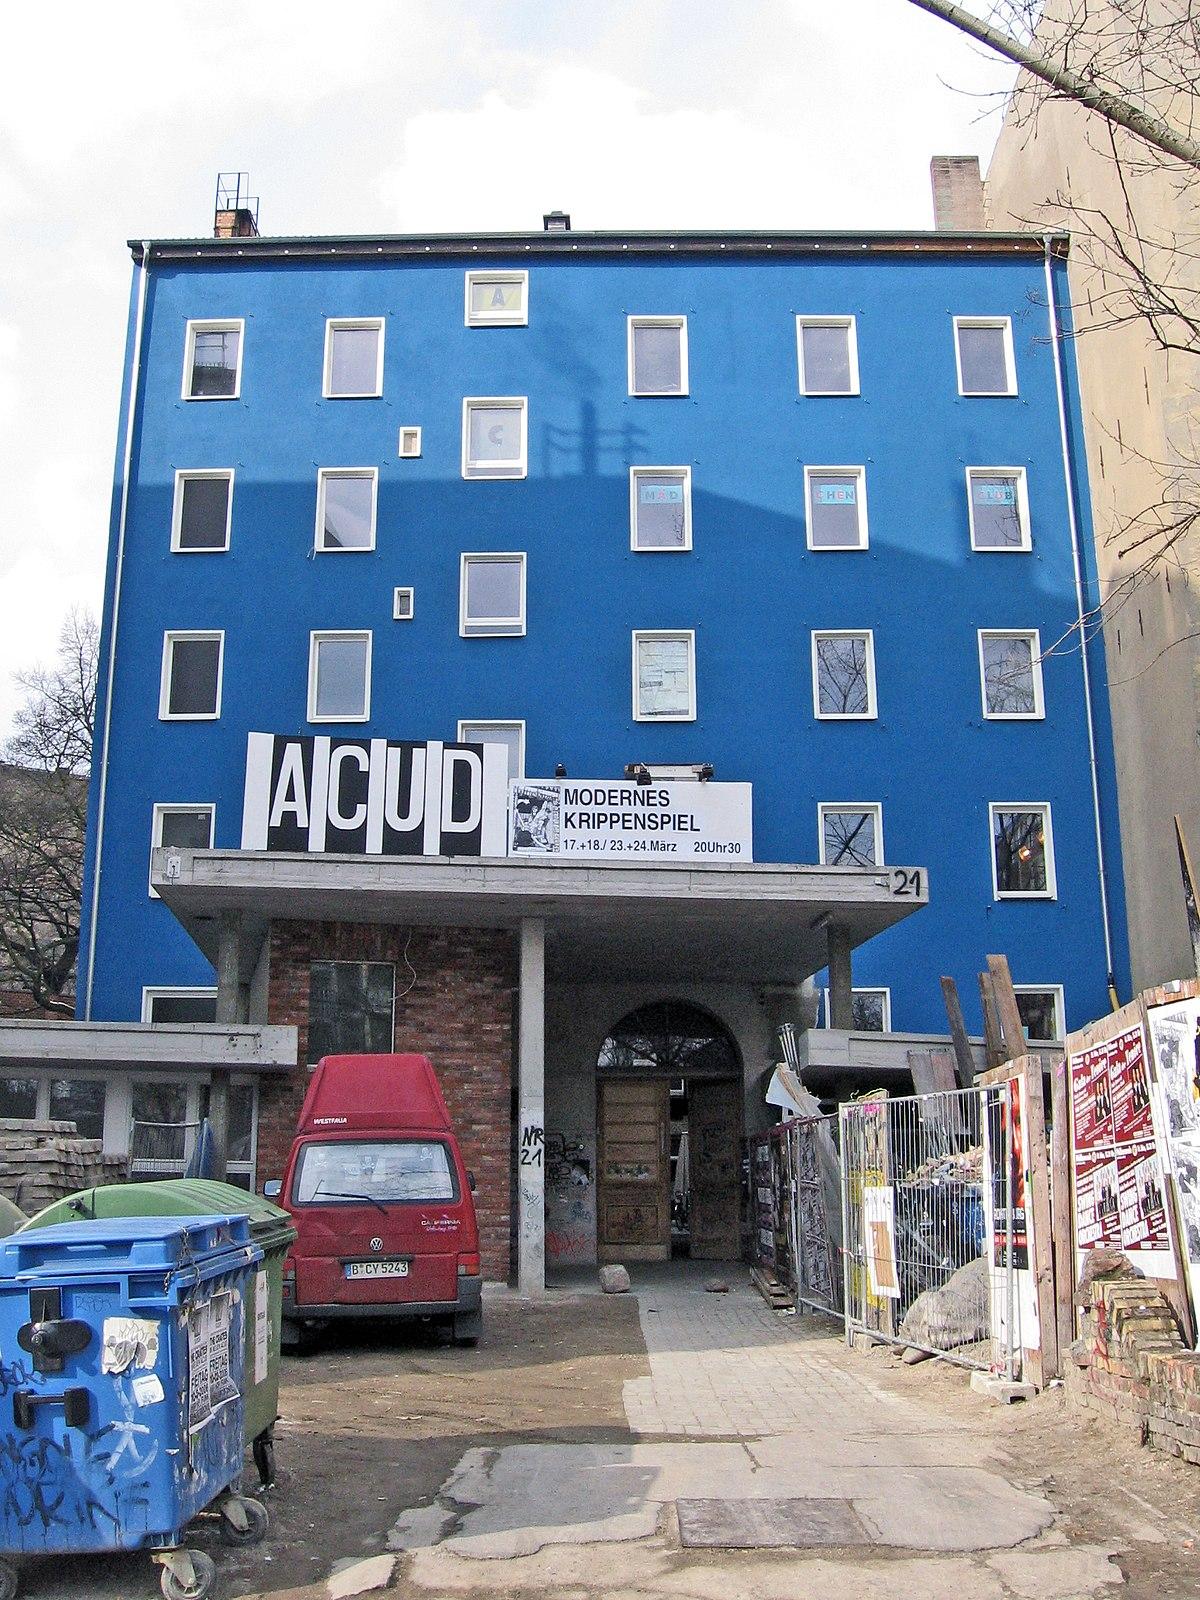 Acud Berlin